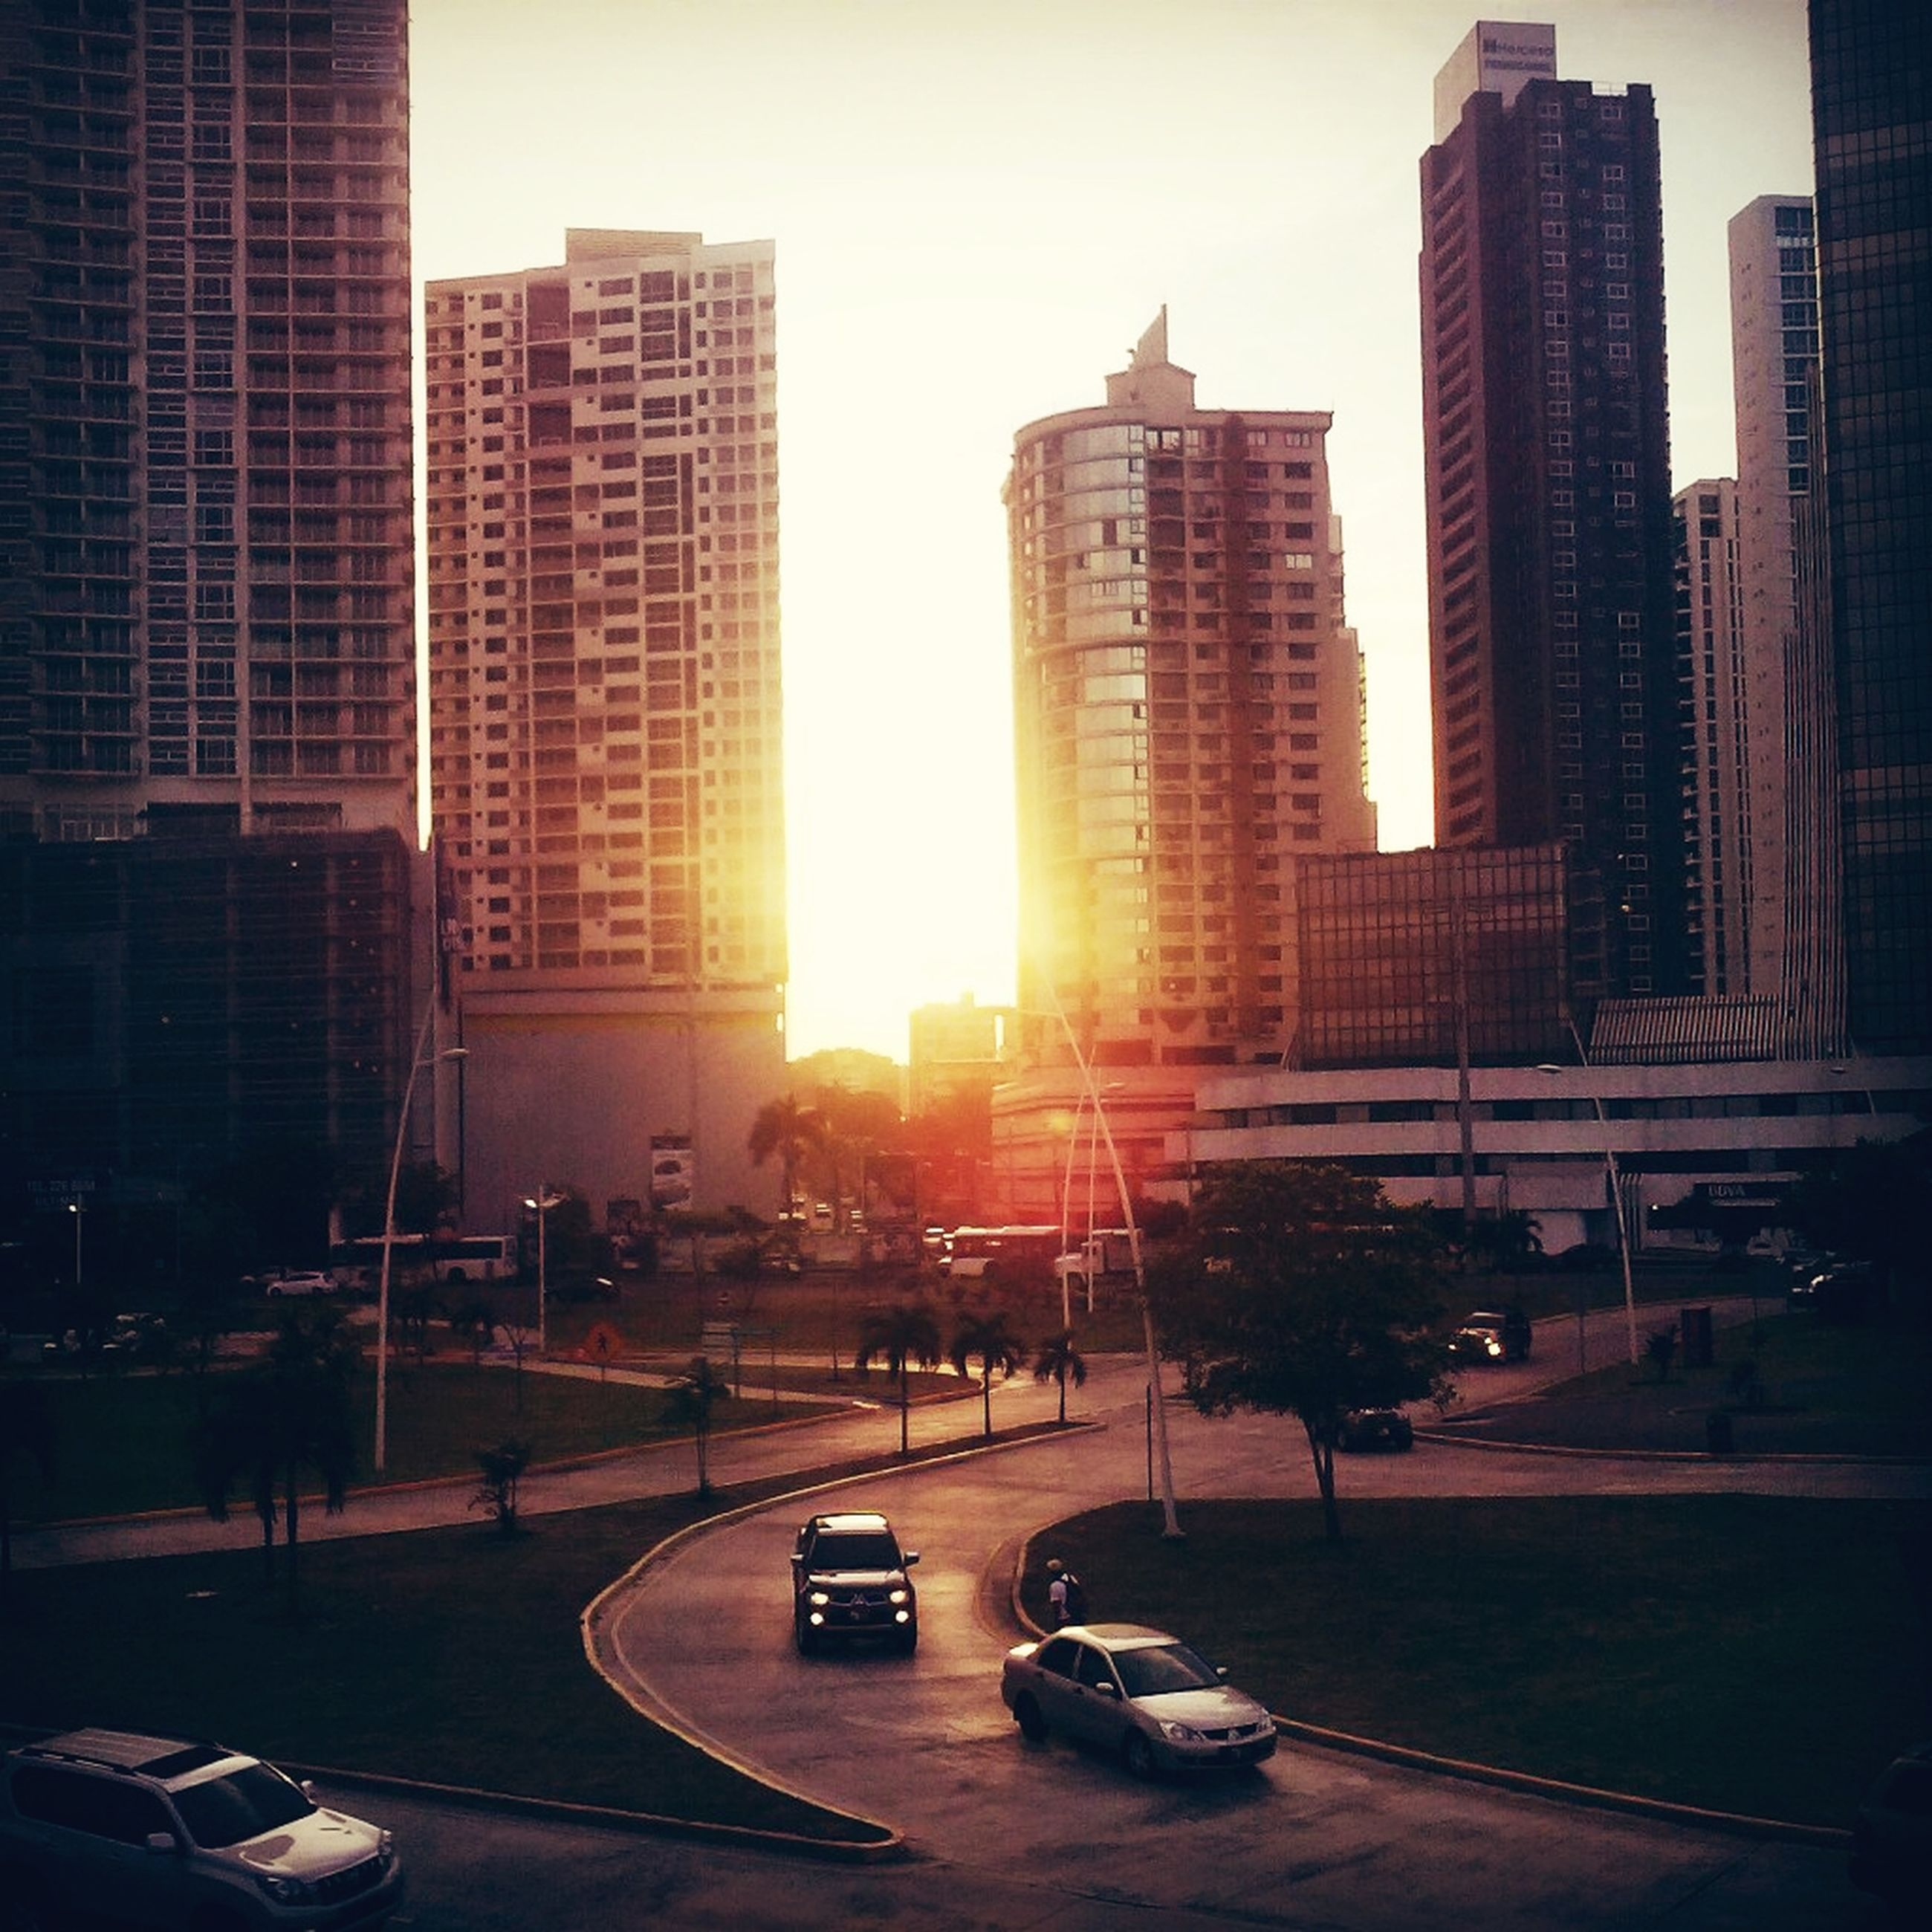 building exterior, architecture, city, built structure, skyscraper, sunset, transportation, office building, car, street, sun, modern, road, tall - high, sunlight, tower, building, city life, land vehicle, city street